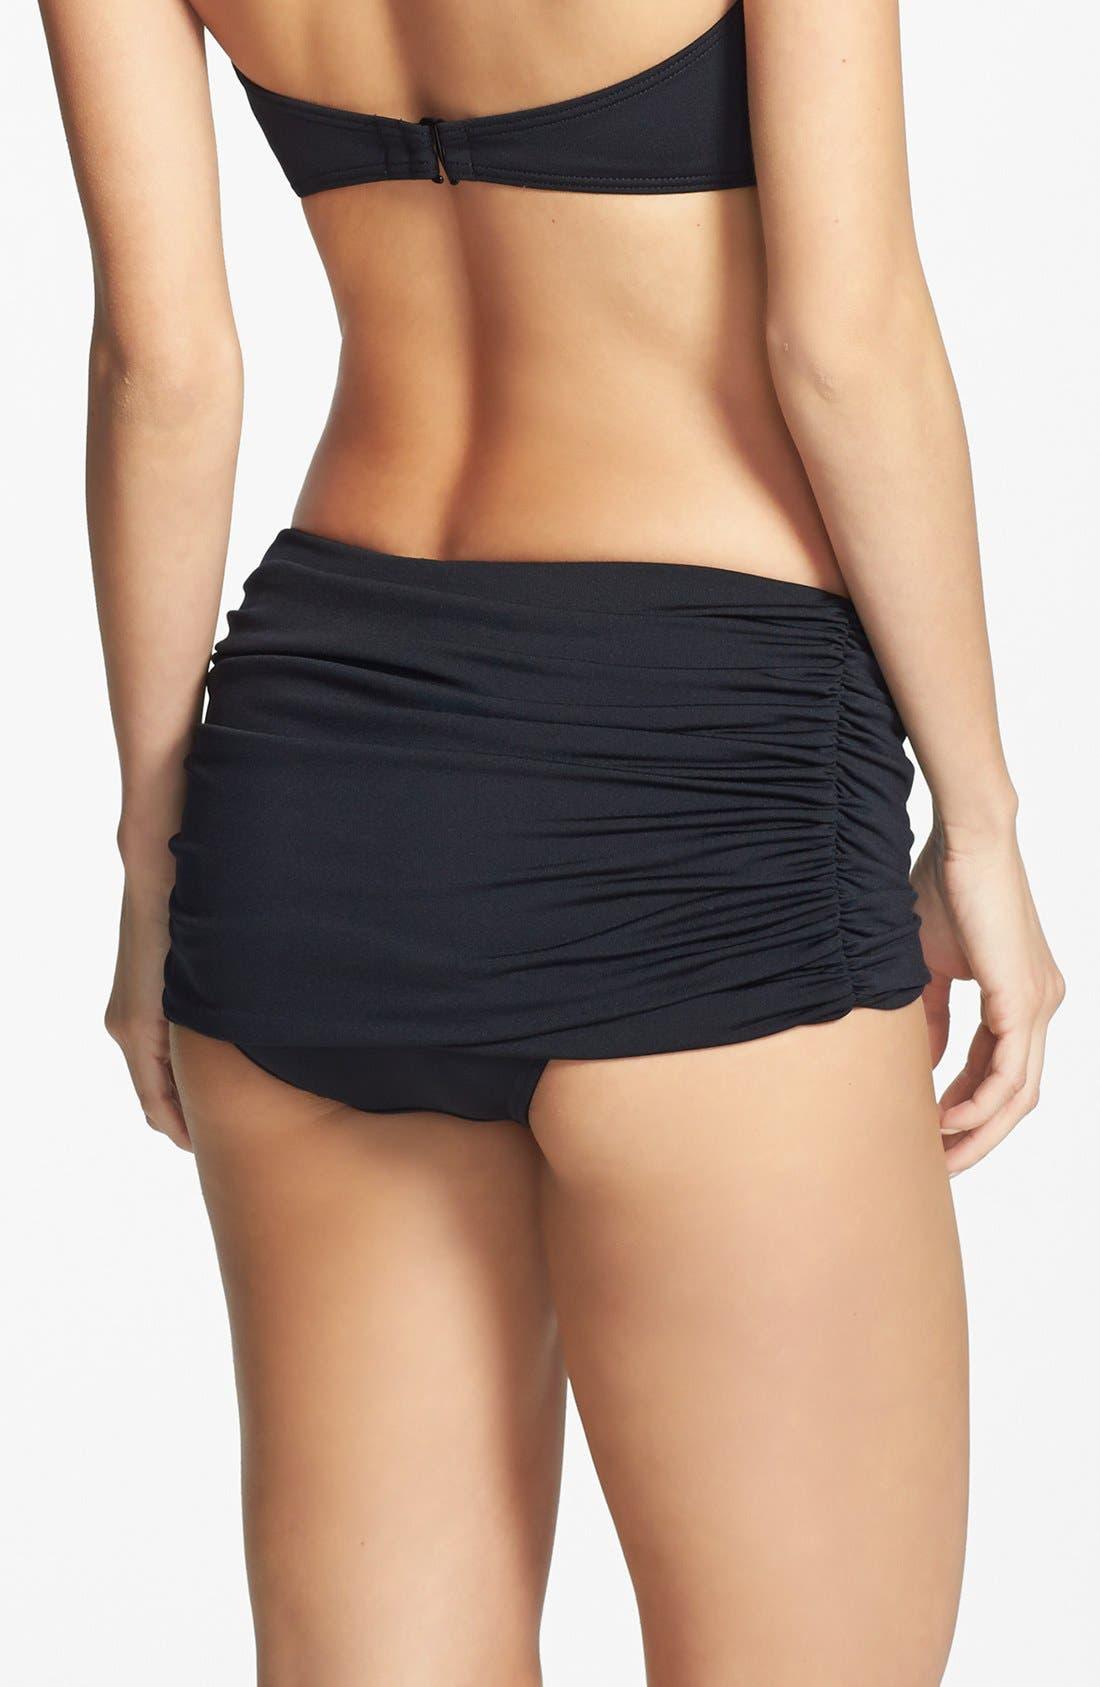 Carmen Marc Valvo 'Cape Town Beach' Shirred Skirted Bikini Bottoms,                             Alternate thumbnail 2, color,                             Luxe Black